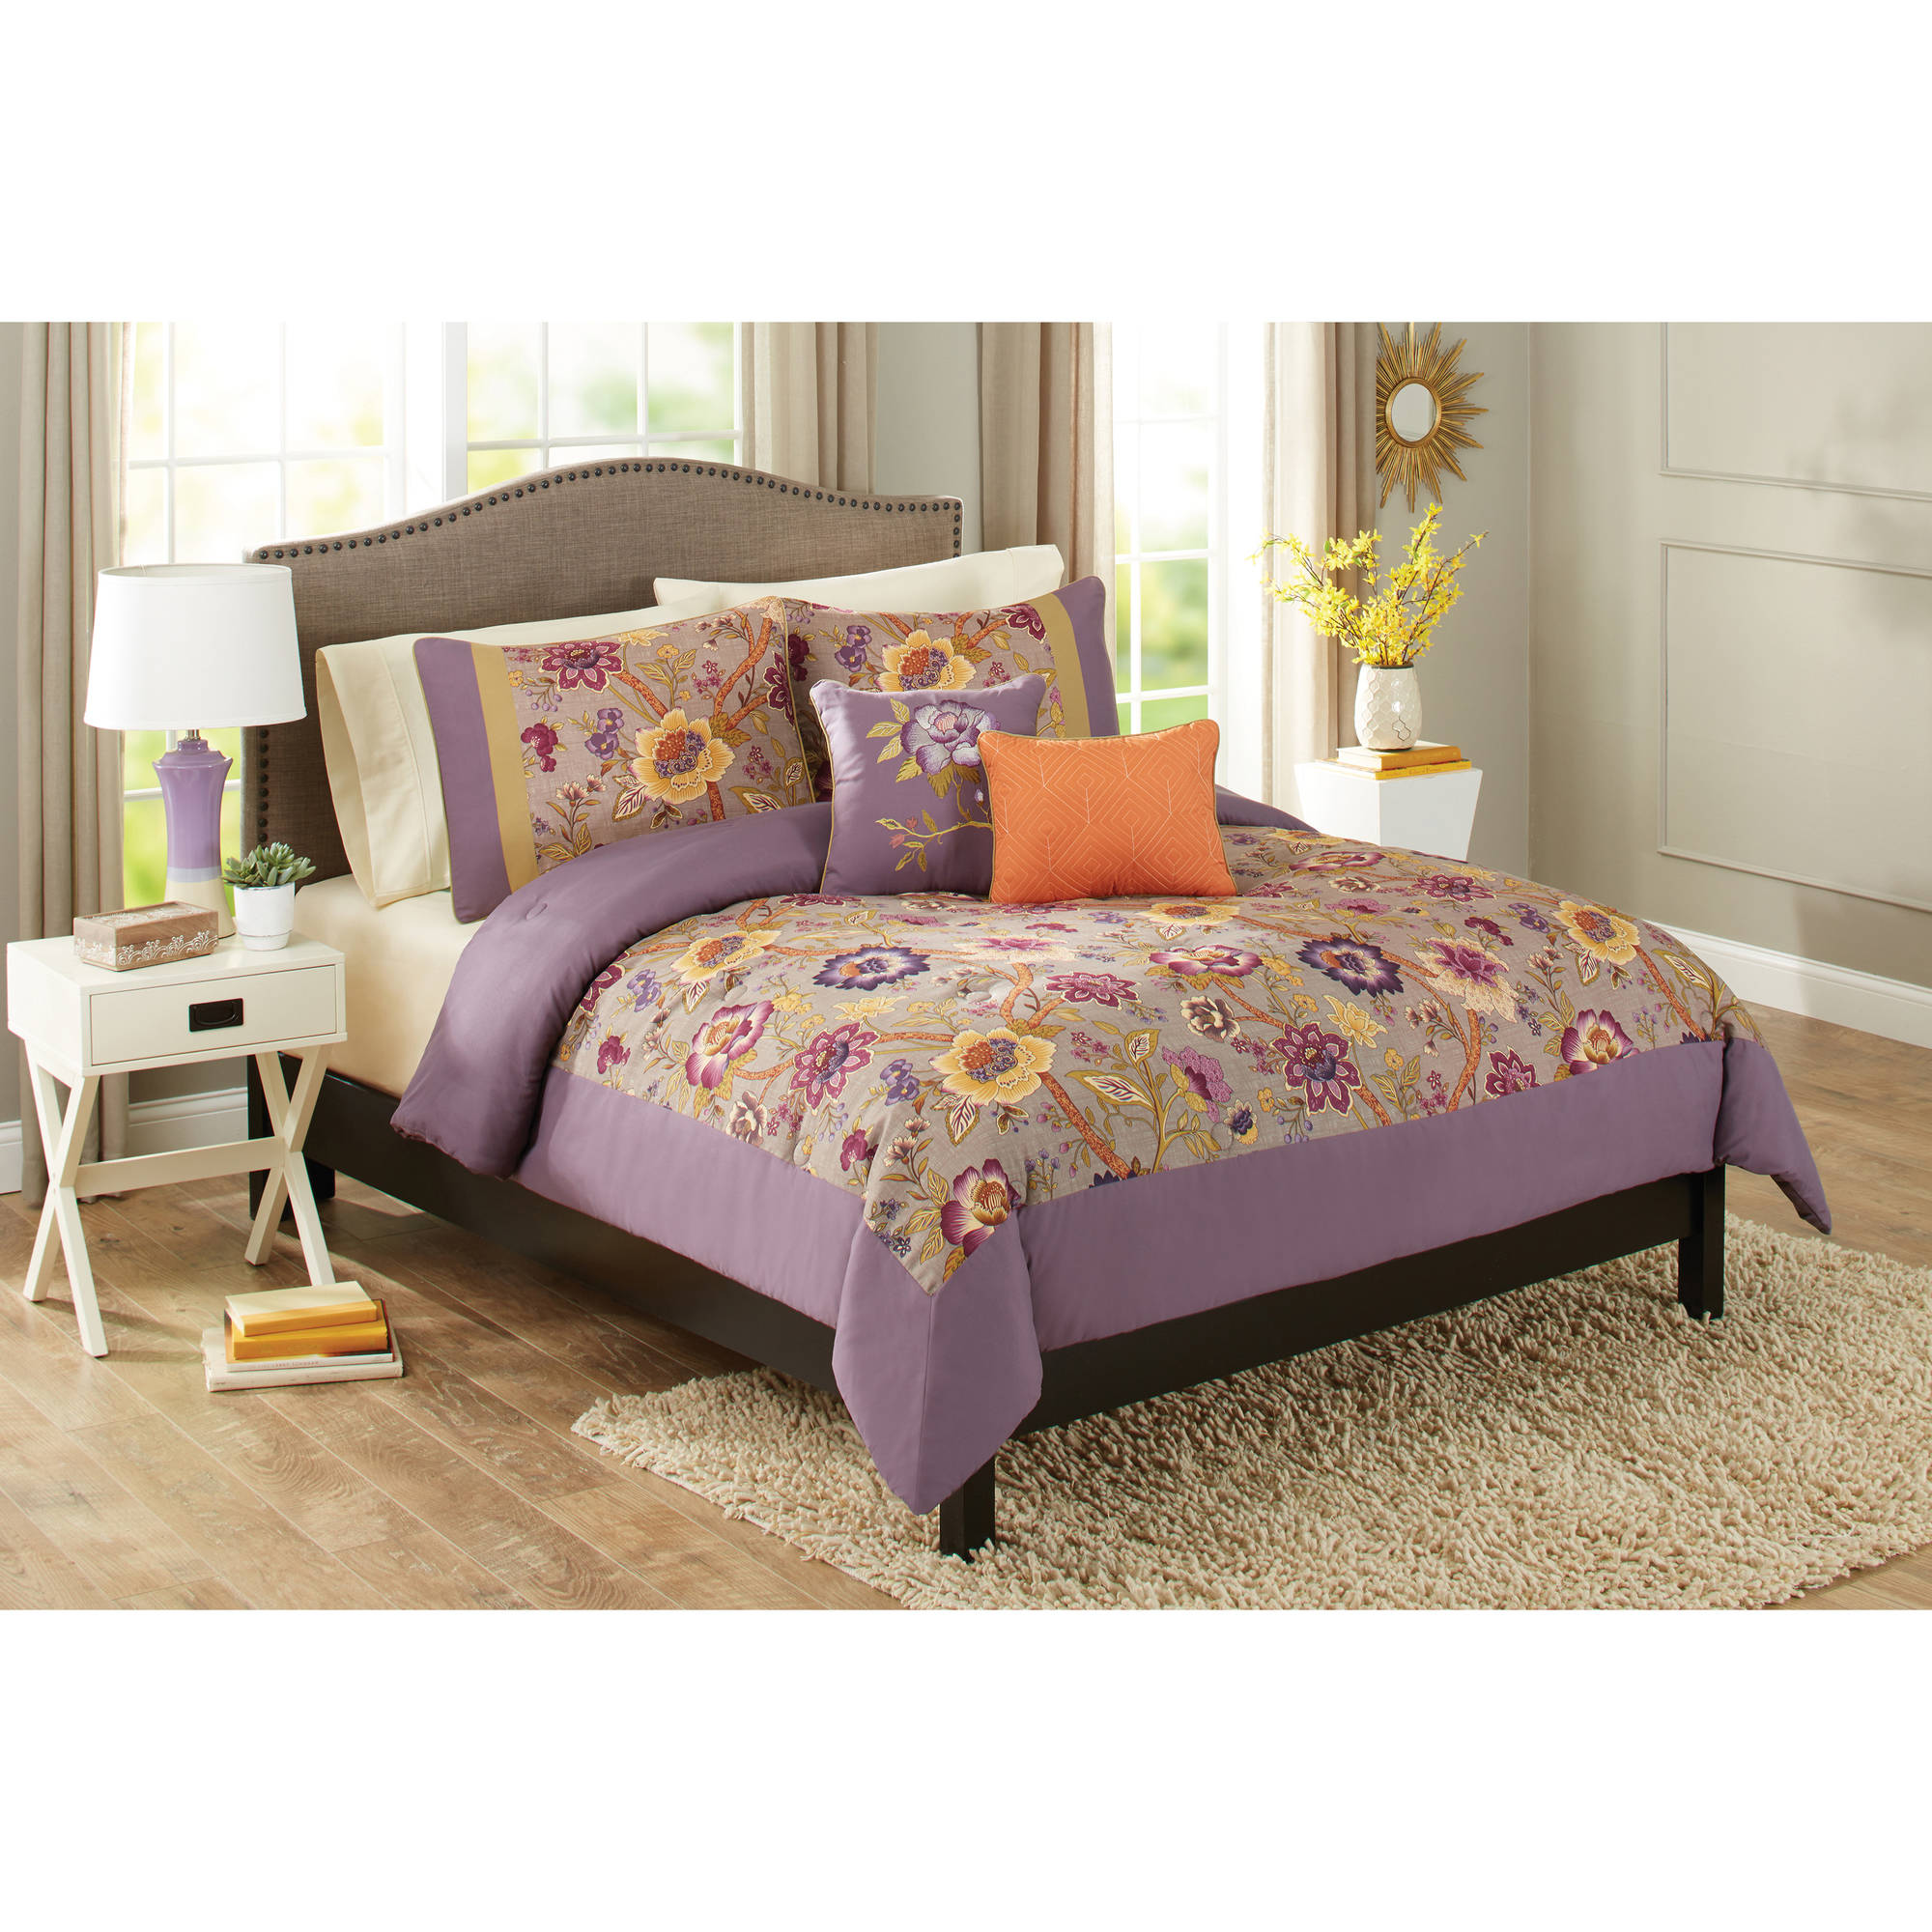 Better Homes and Gardens 5-Piece Rose Garden Bedding Comforter Set